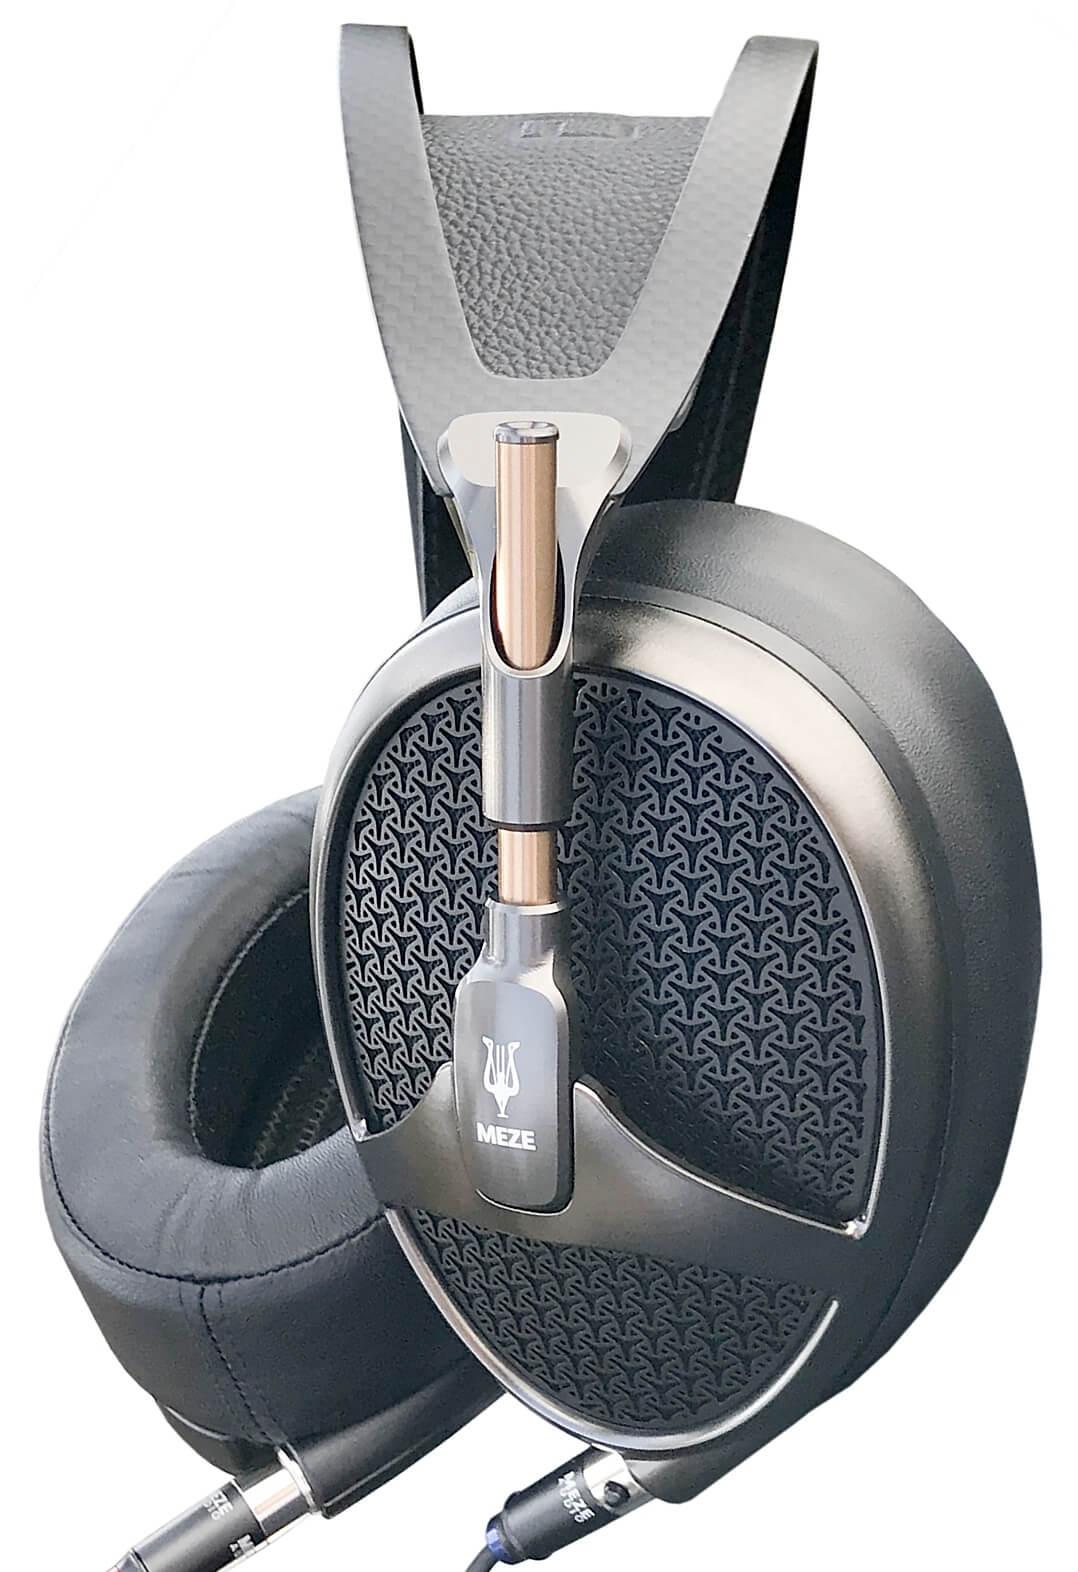 Meze Empyrean Kopfhörer komplett seitlich